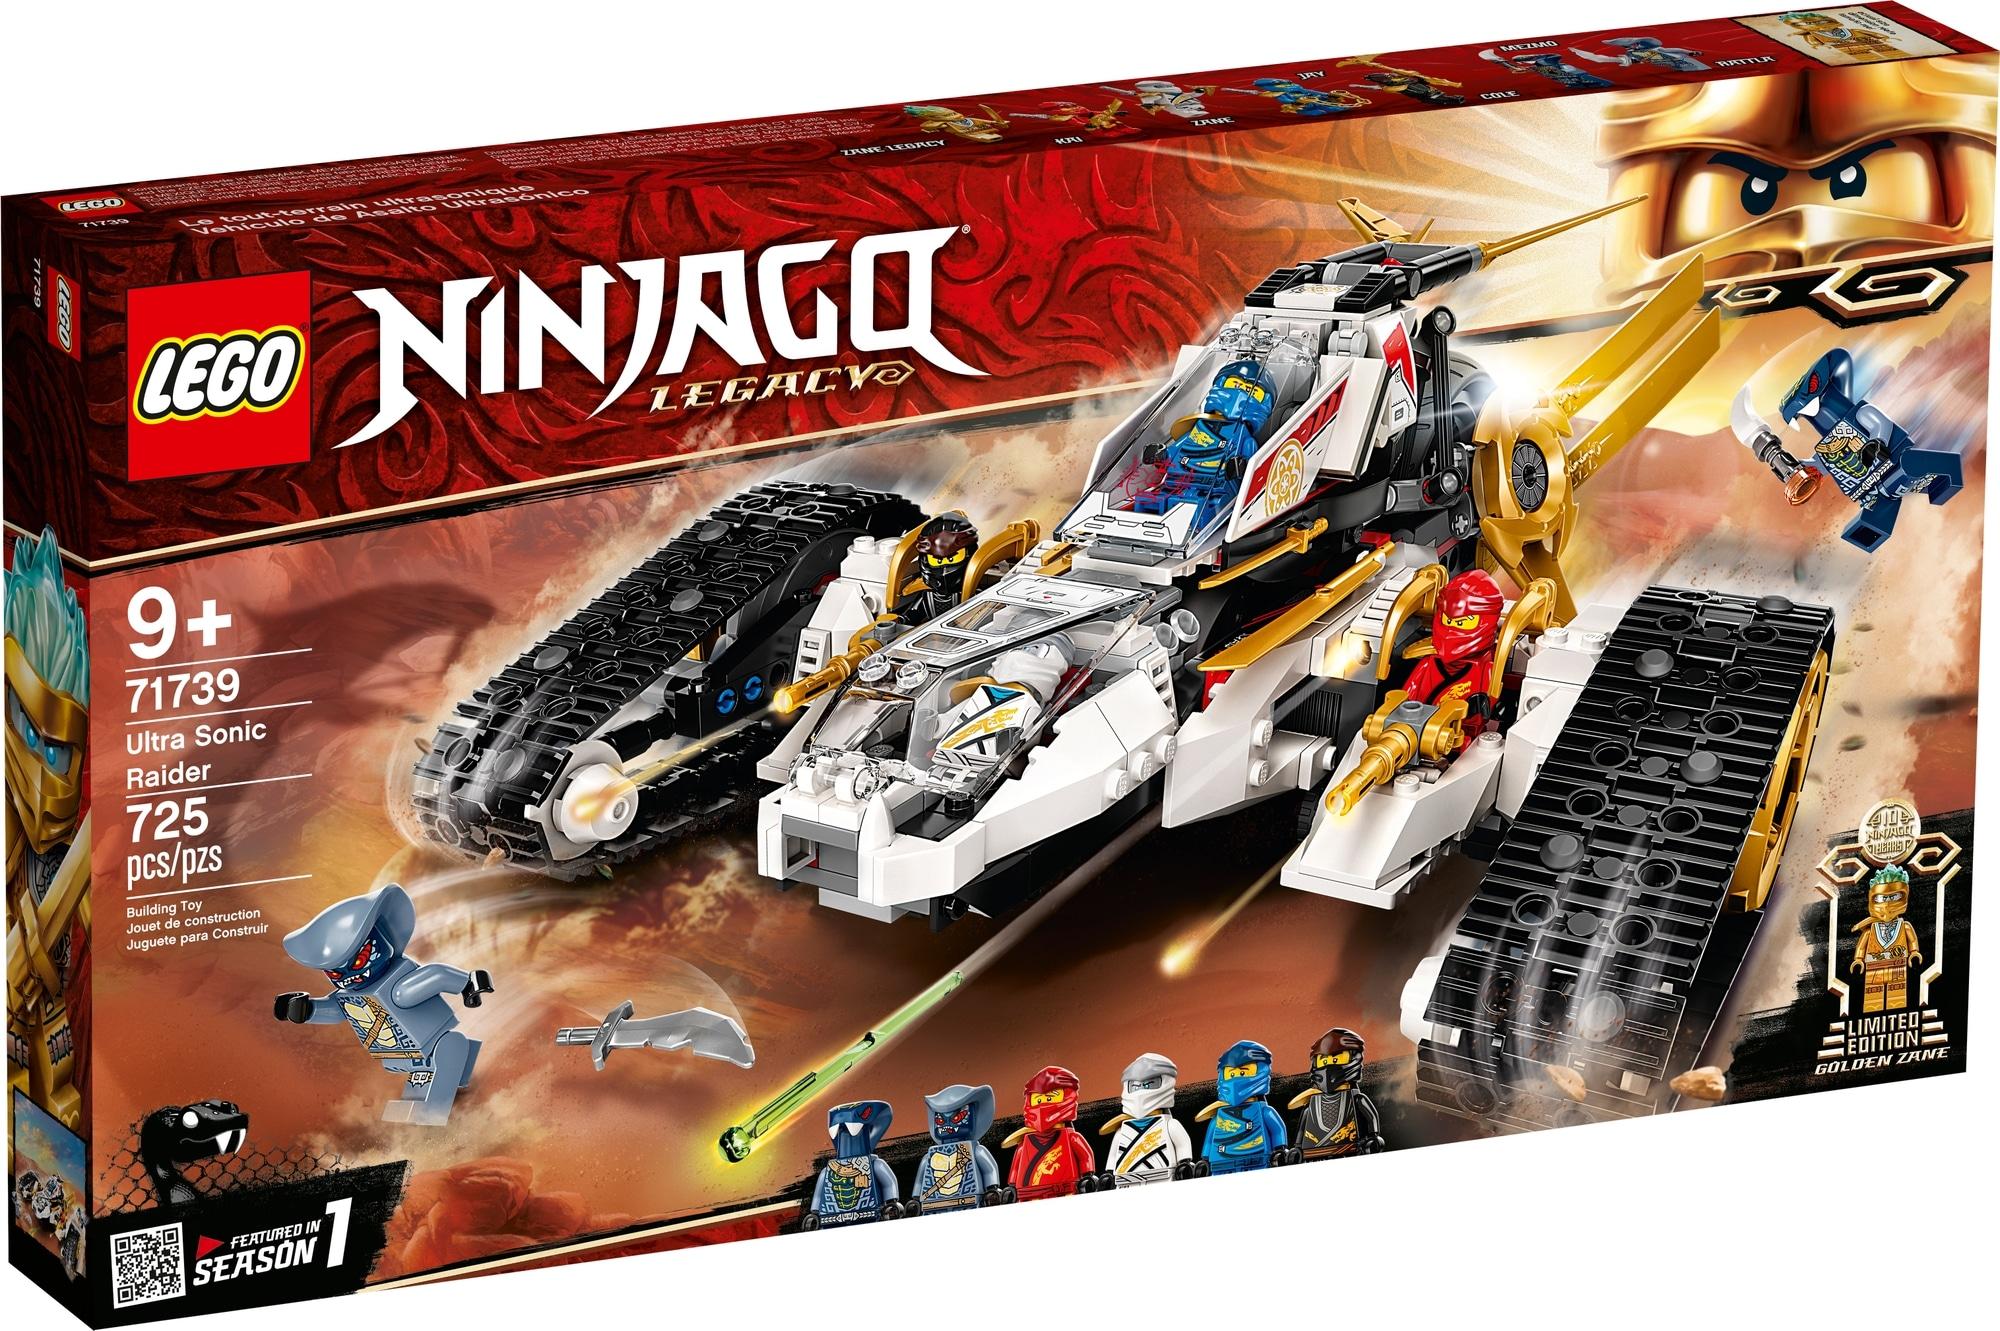 LEGO Ninjago 71739 Ultraschall Raider 2